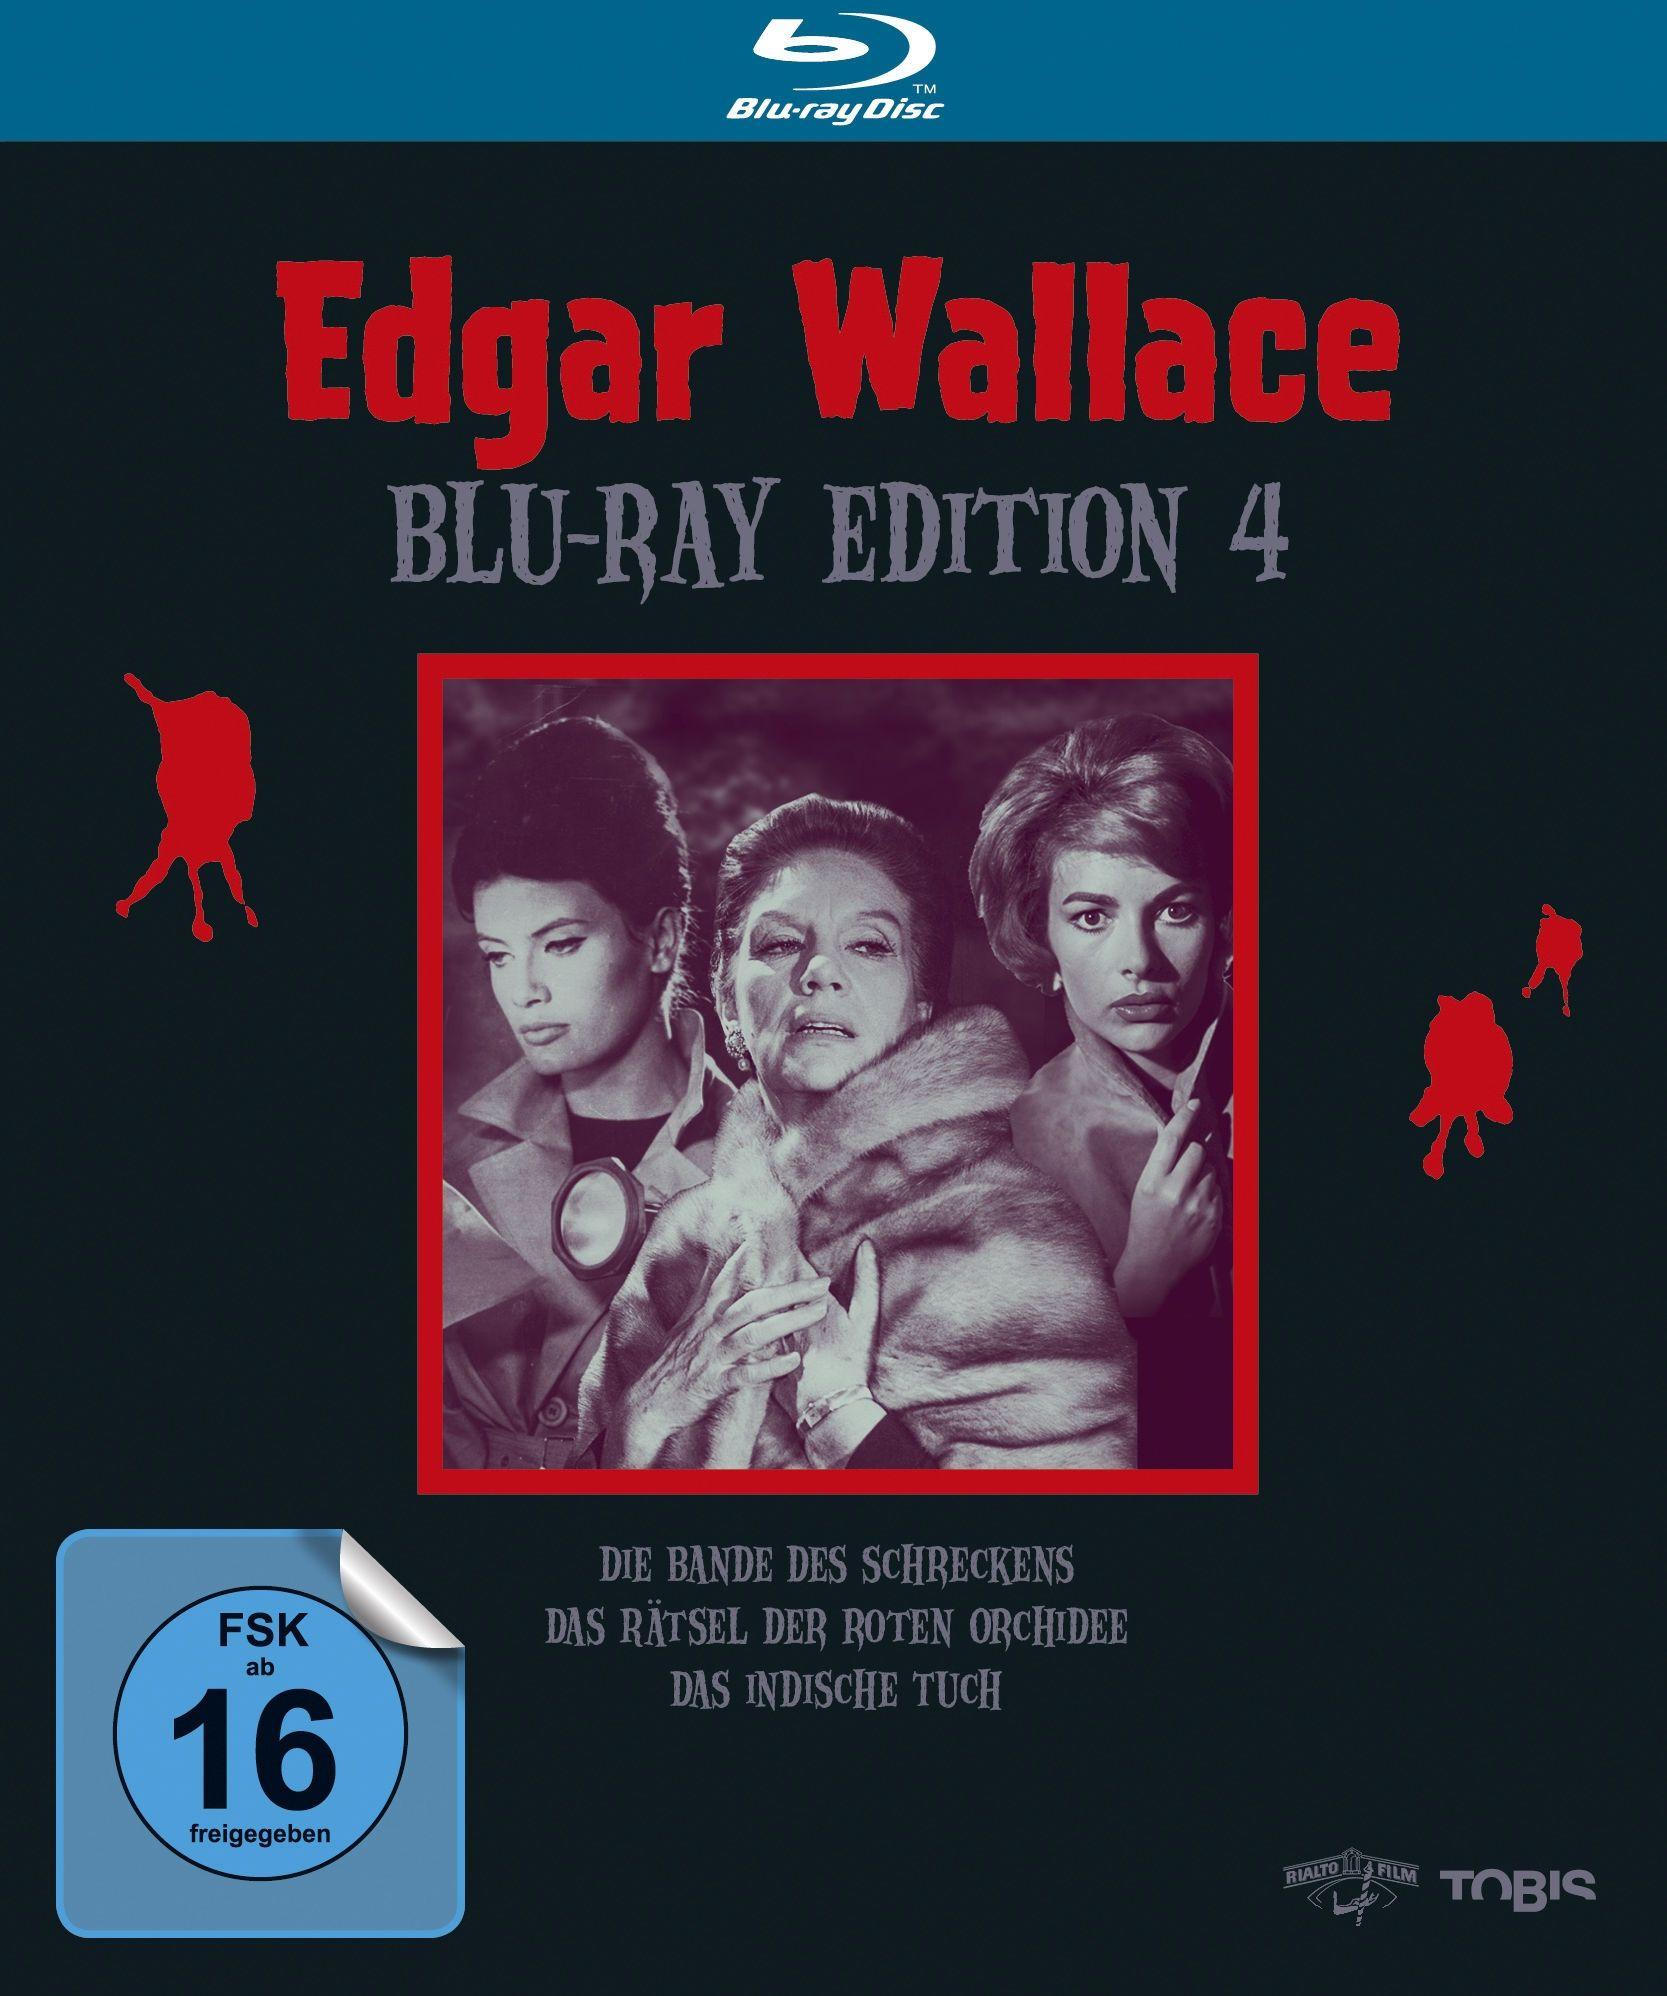 Edgar Wallace - Edition 4 (3 Discs) (BLURAY)